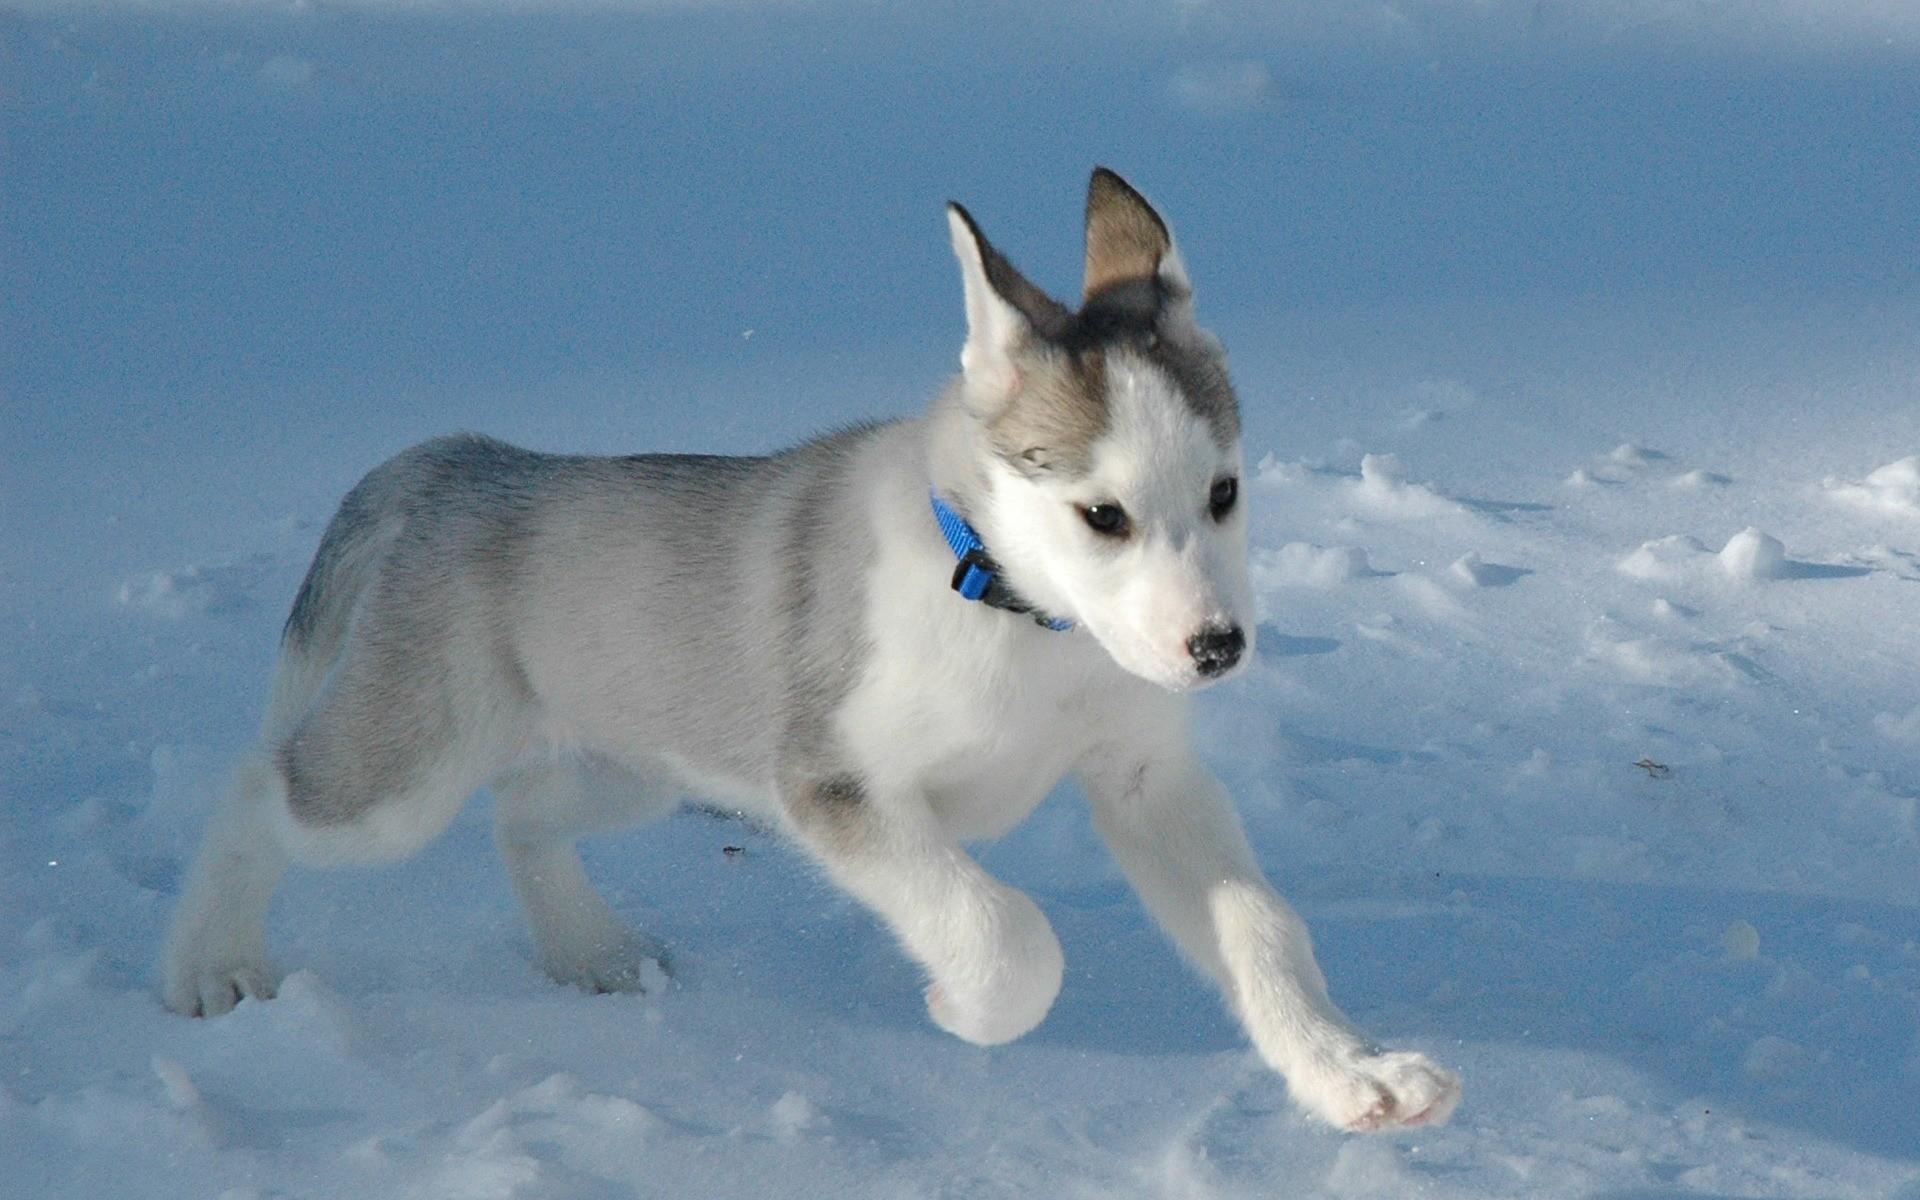 Pequeño perro lobo blanco - 1920x1200